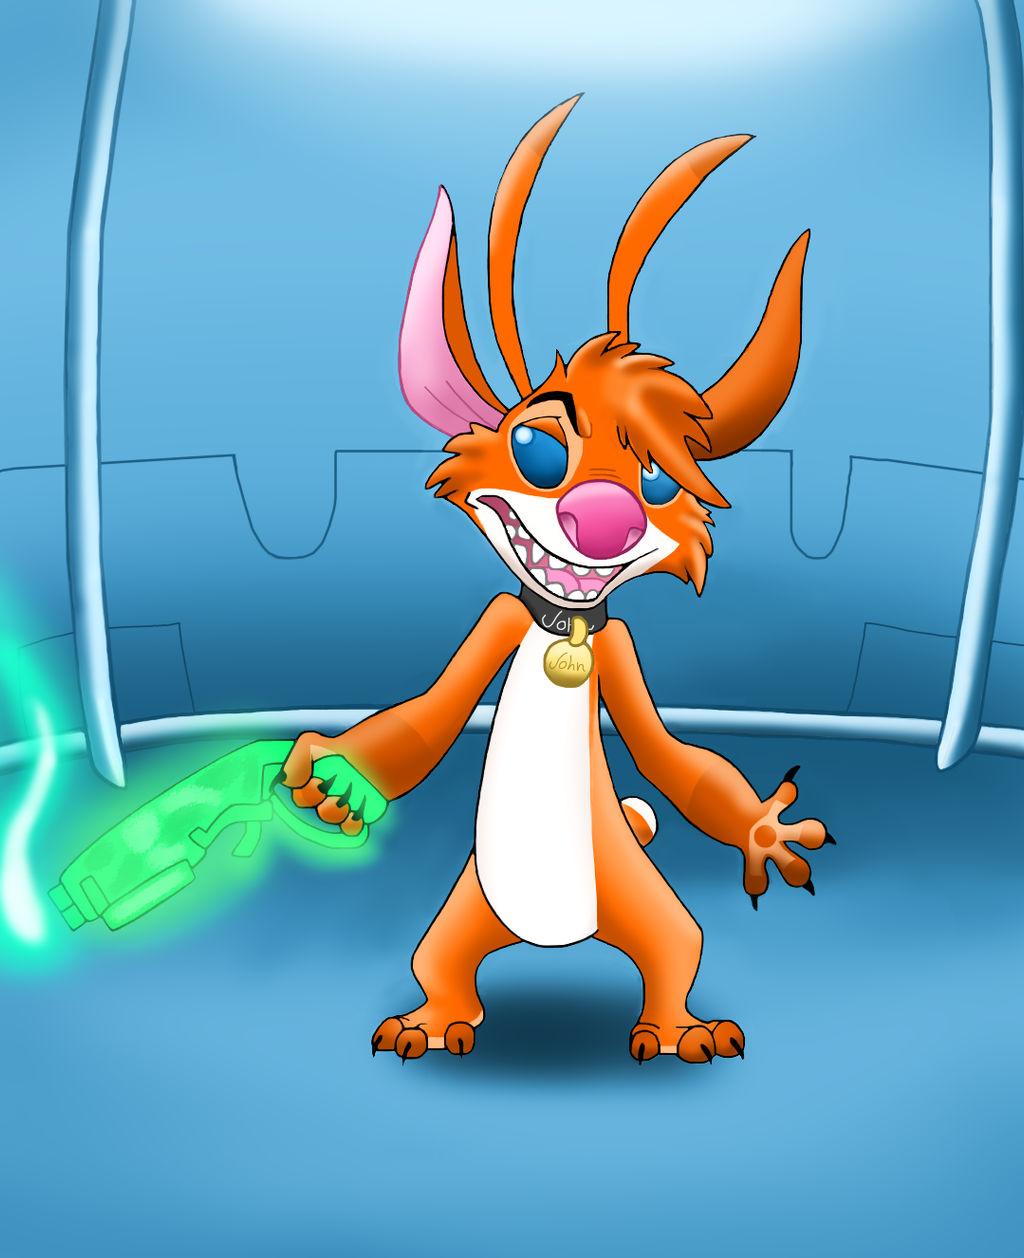 experiment john fox 725 (SpeedPaint)